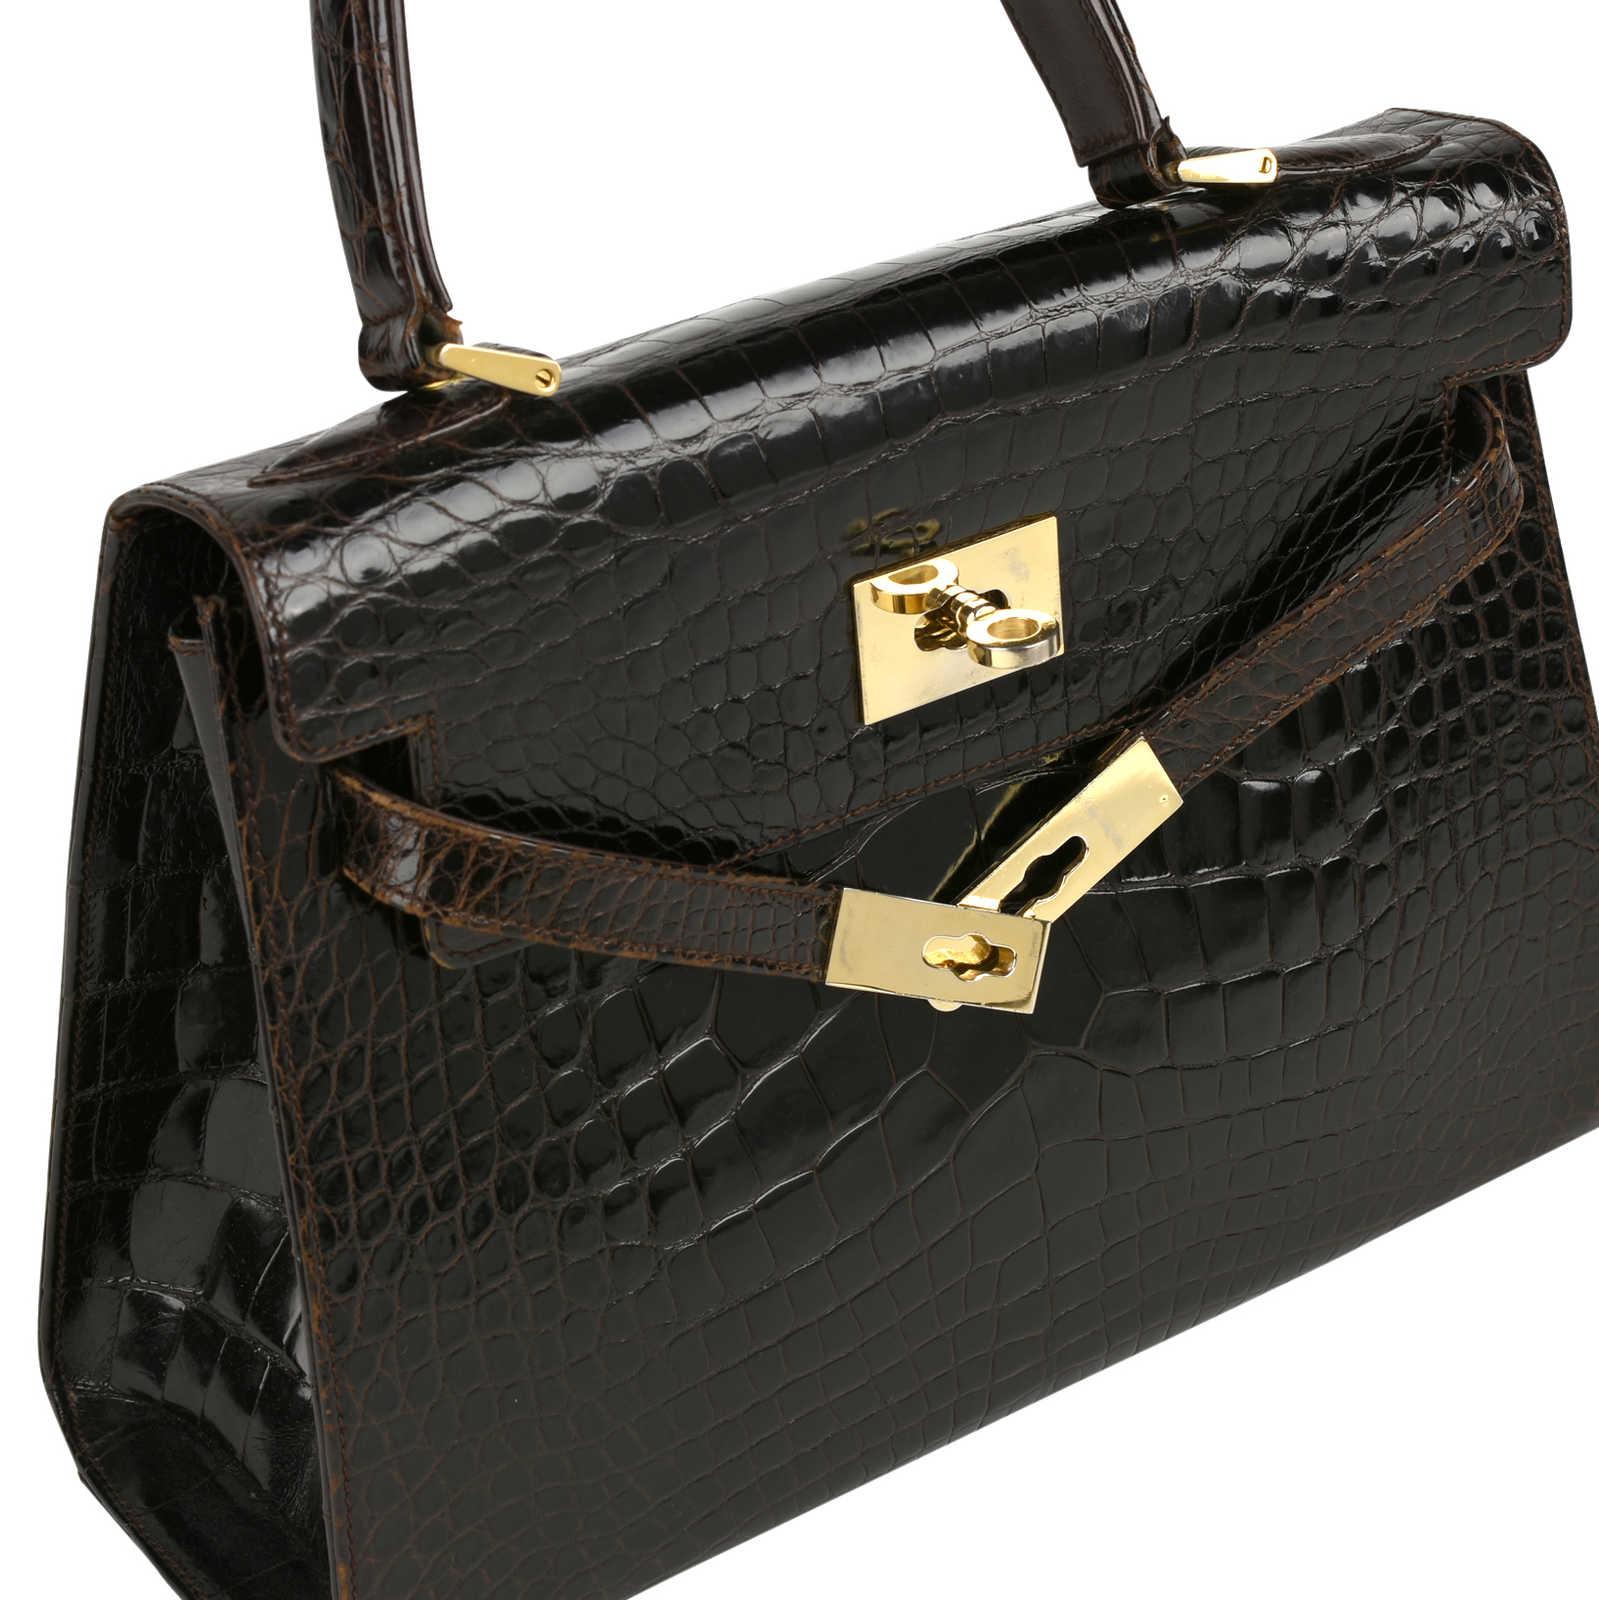 d13983580ac7 ... Authentic Vintage Bally Kelly Style Bag (PSS-355-00023) - Thumbnail 5  ...